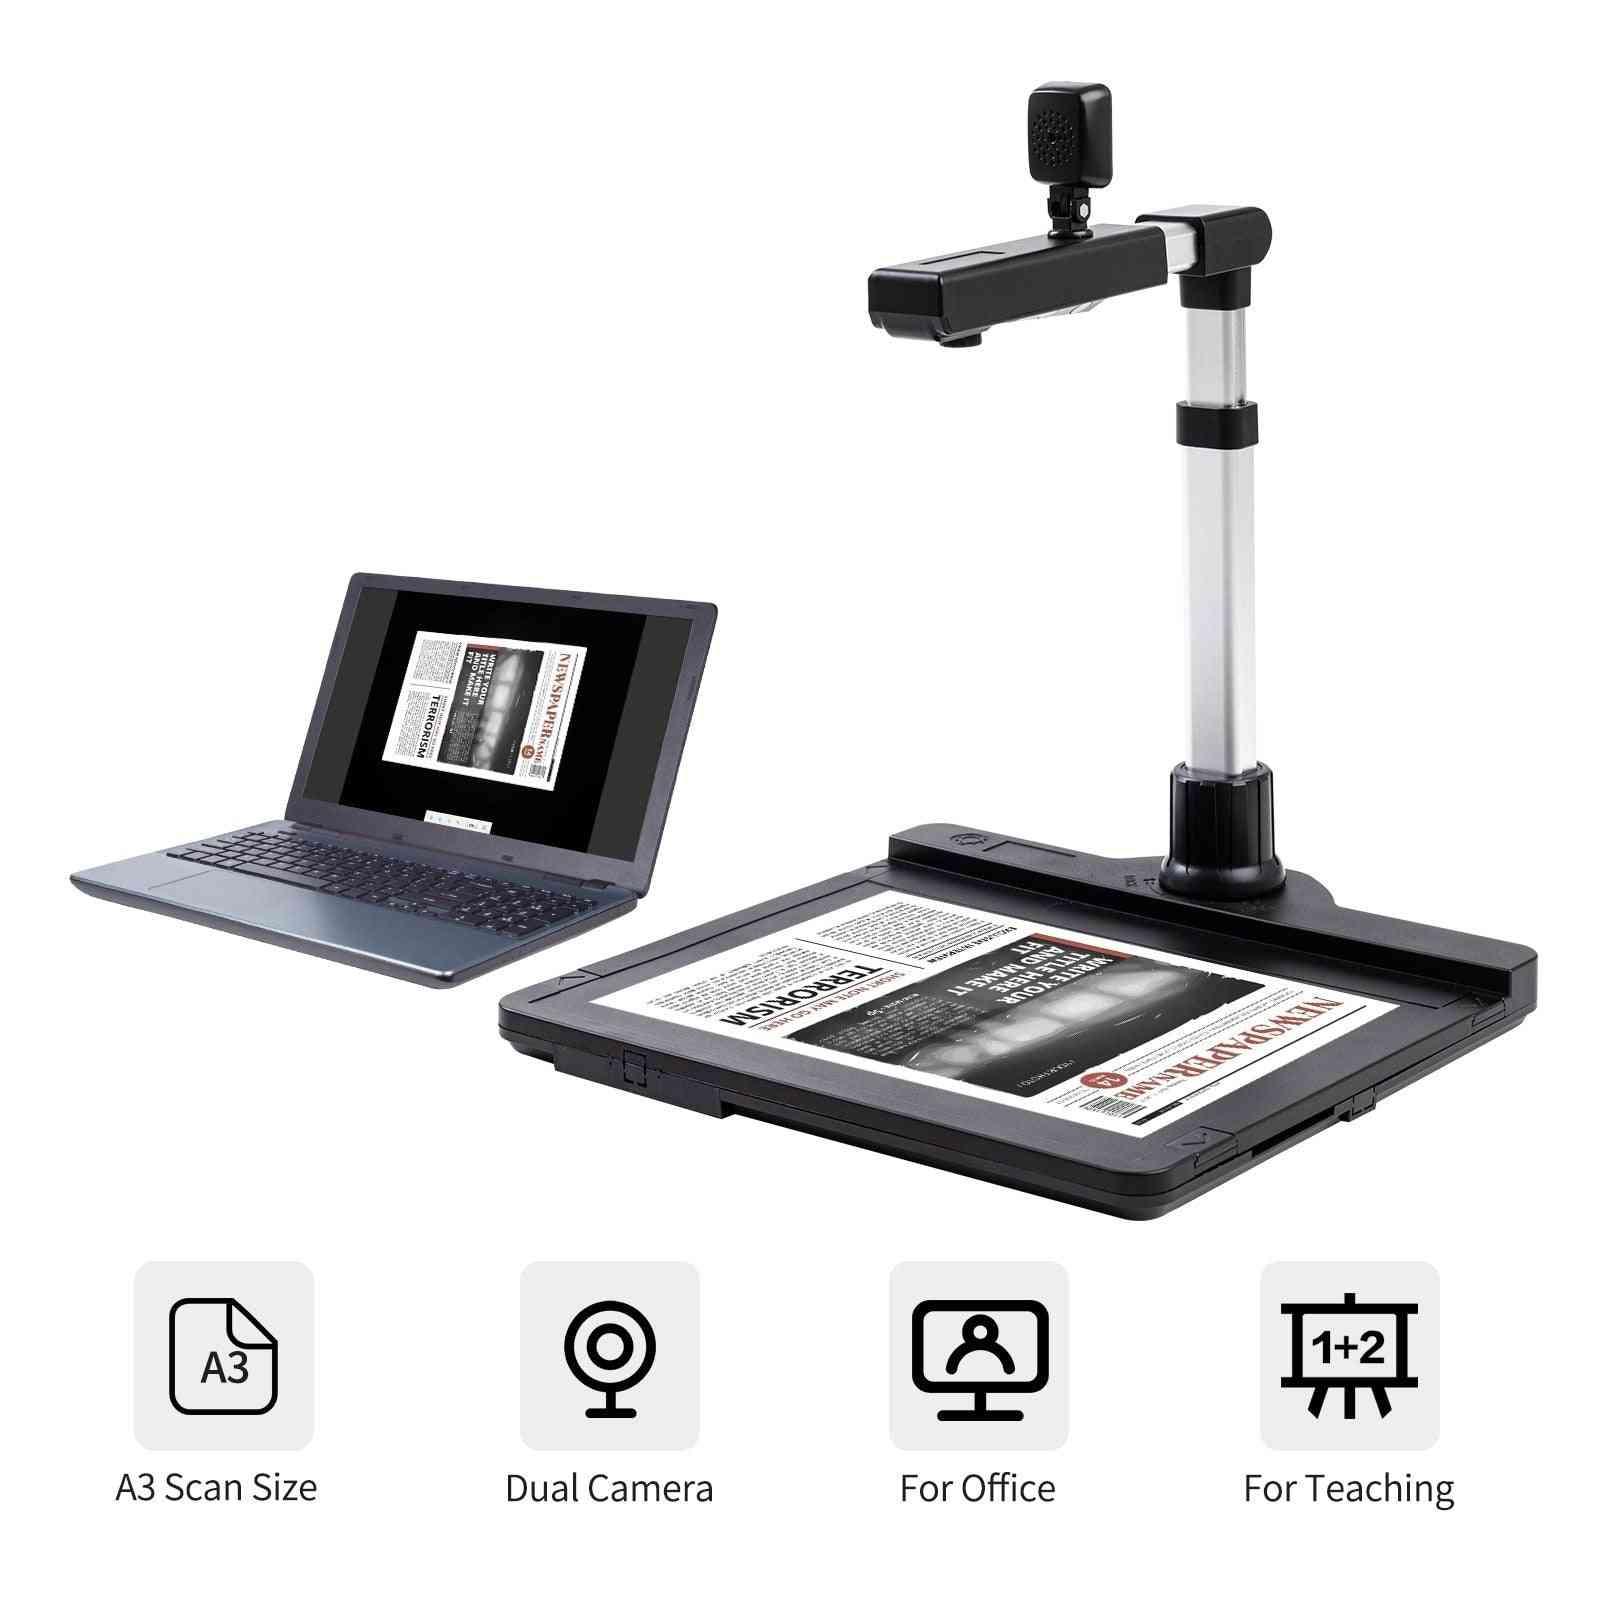 Document Camera Scanner A3 Capture Size Dual Camera Scanner